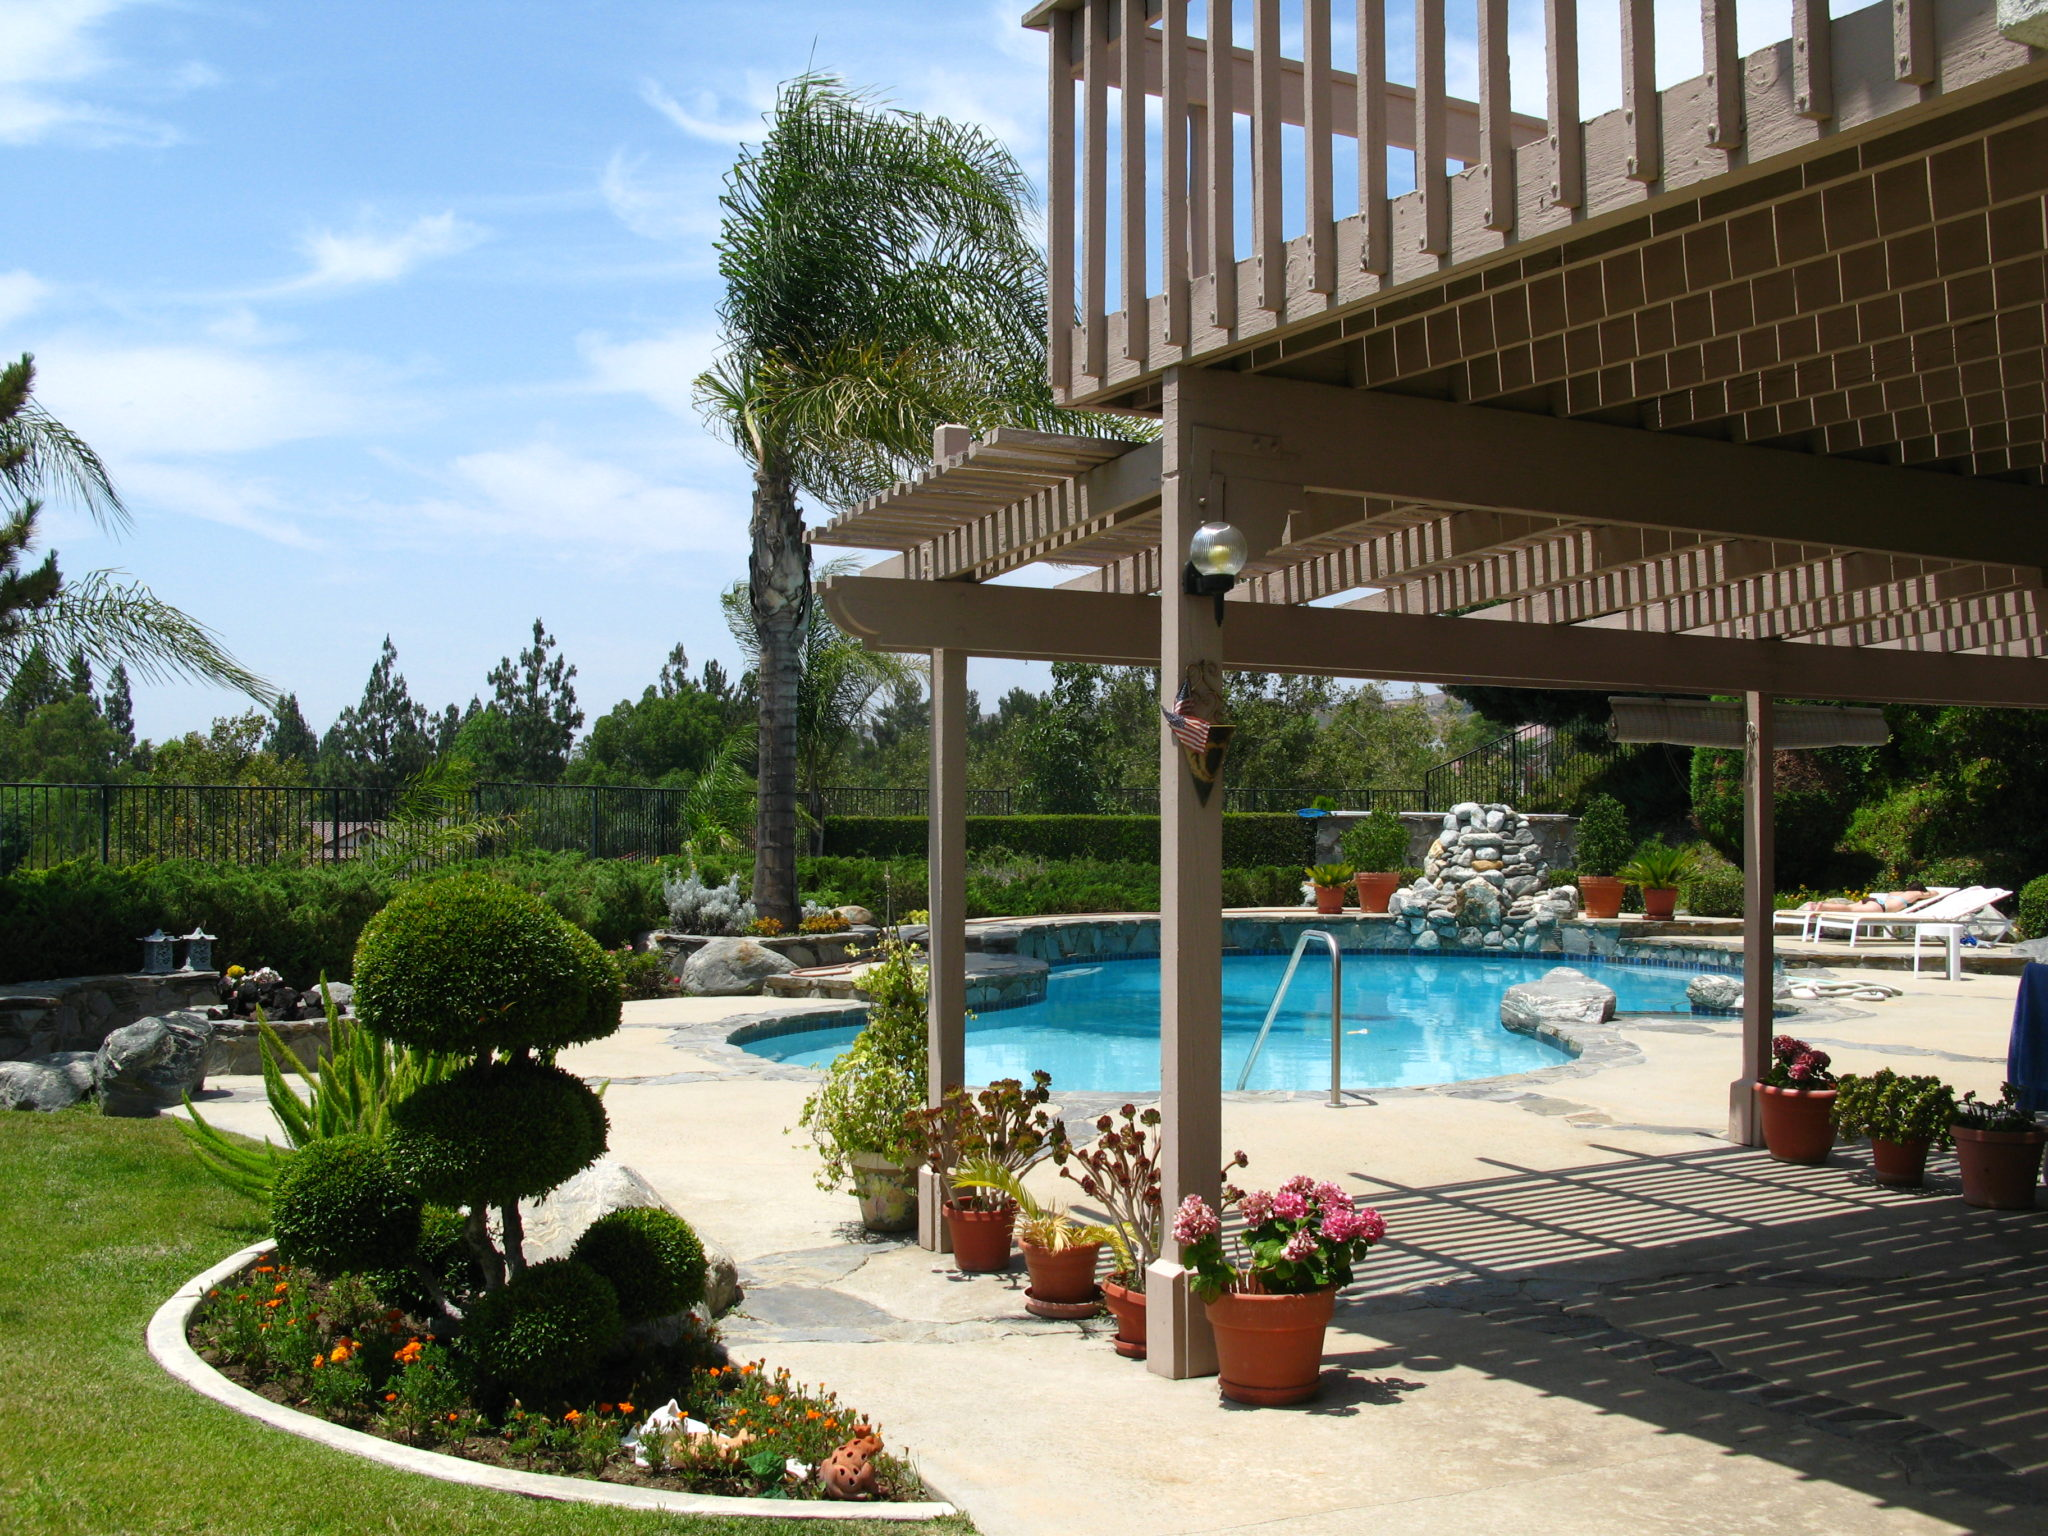 patios and decks on Pool Deck Patio Ideas  id=80908